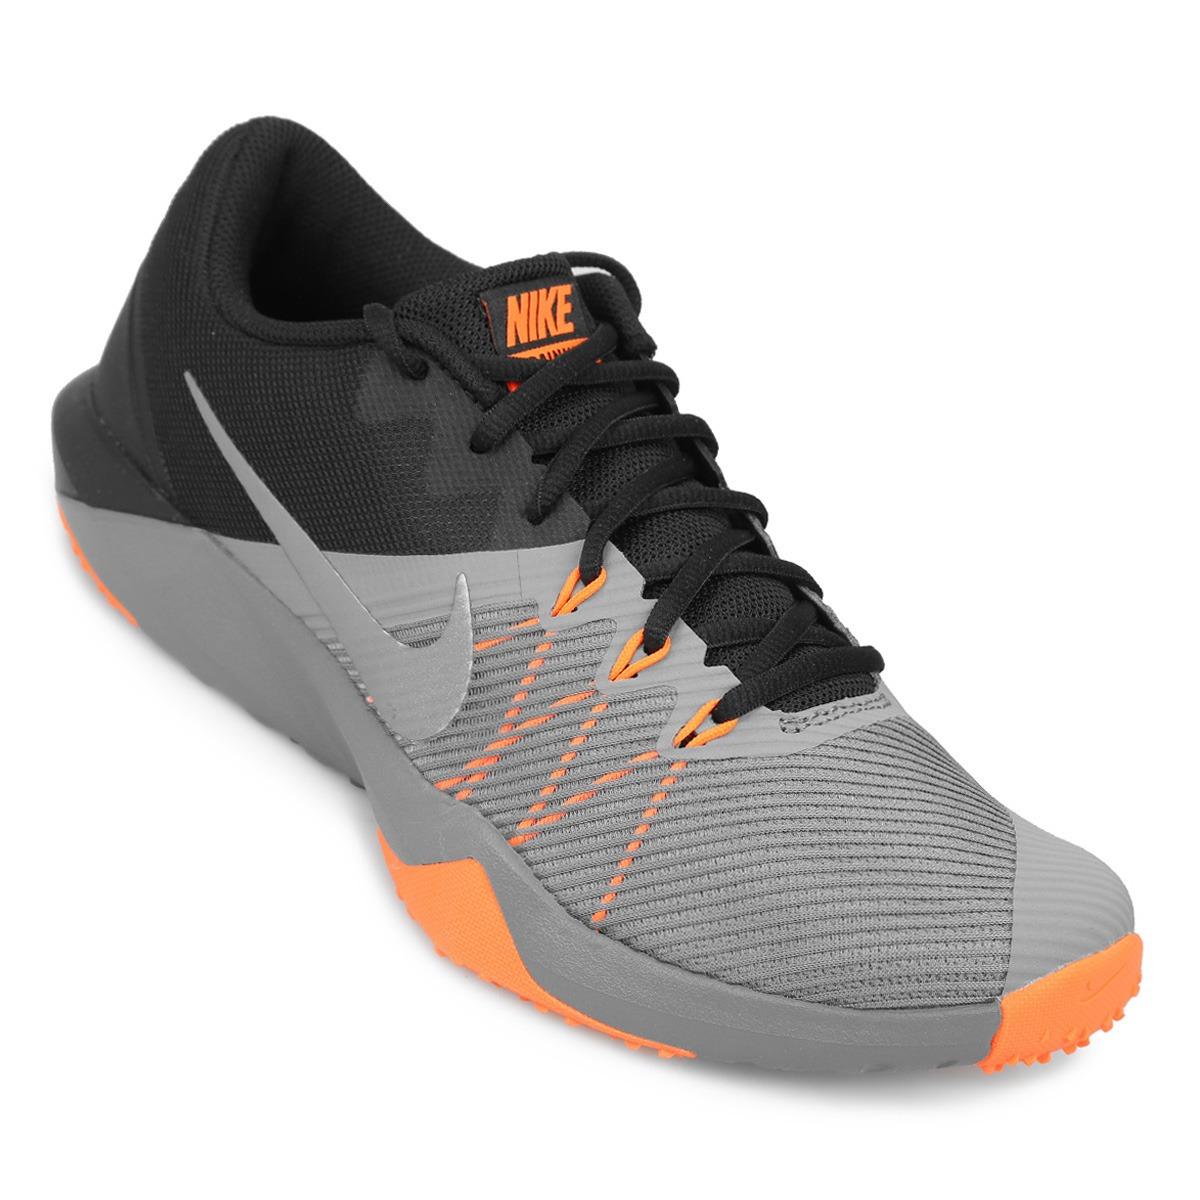 bca060eb616bf Cargando zoom. zapatillas de fitness cross training de hombre retaliation  tr nike. Nike Retaliation TR